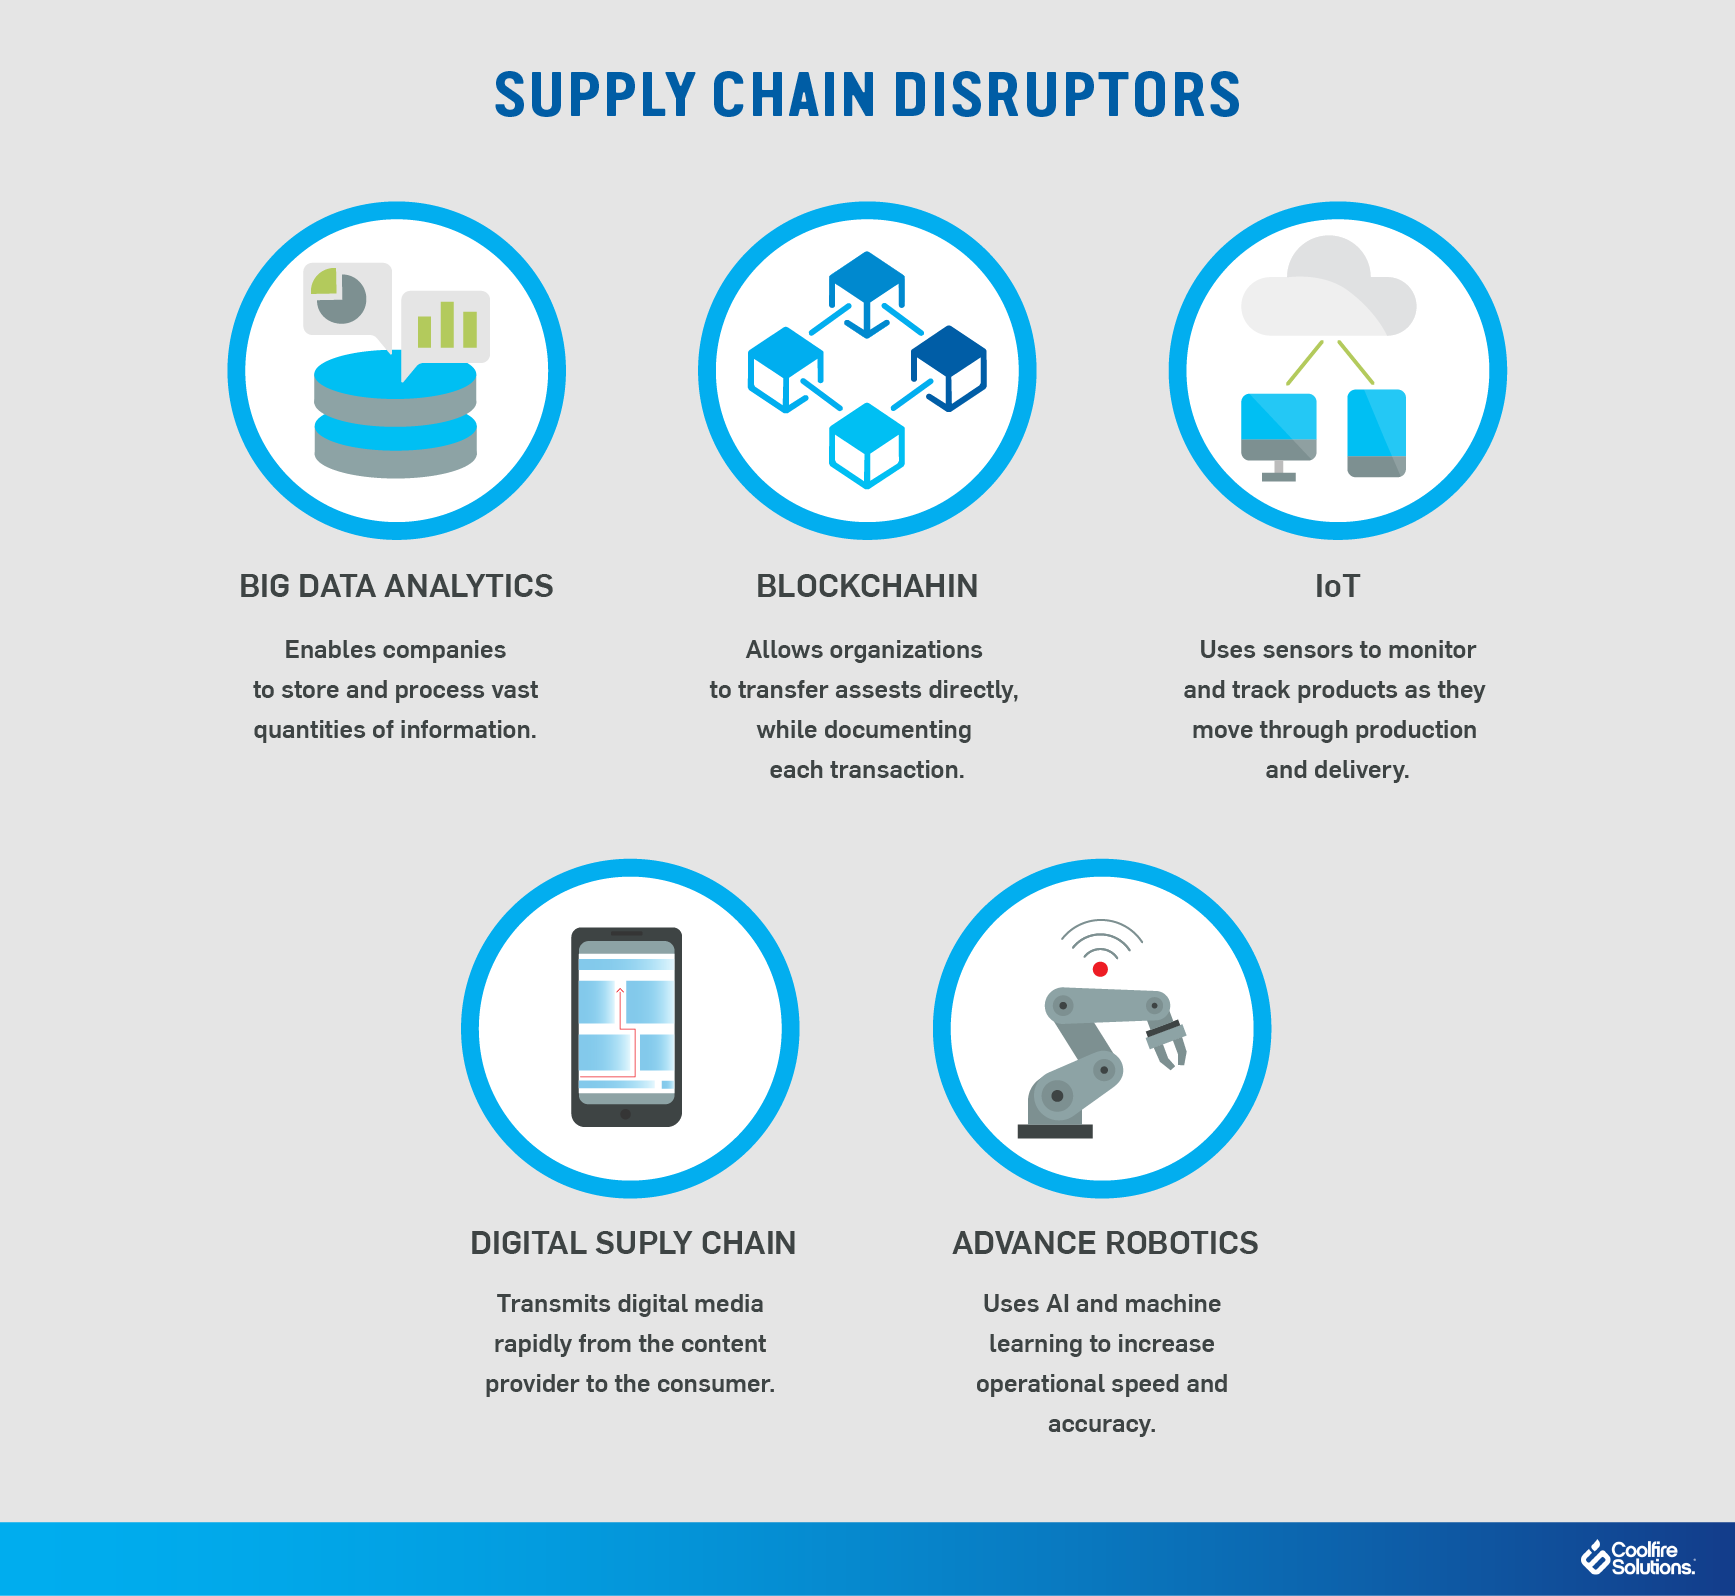 Supply Chain Disruptors